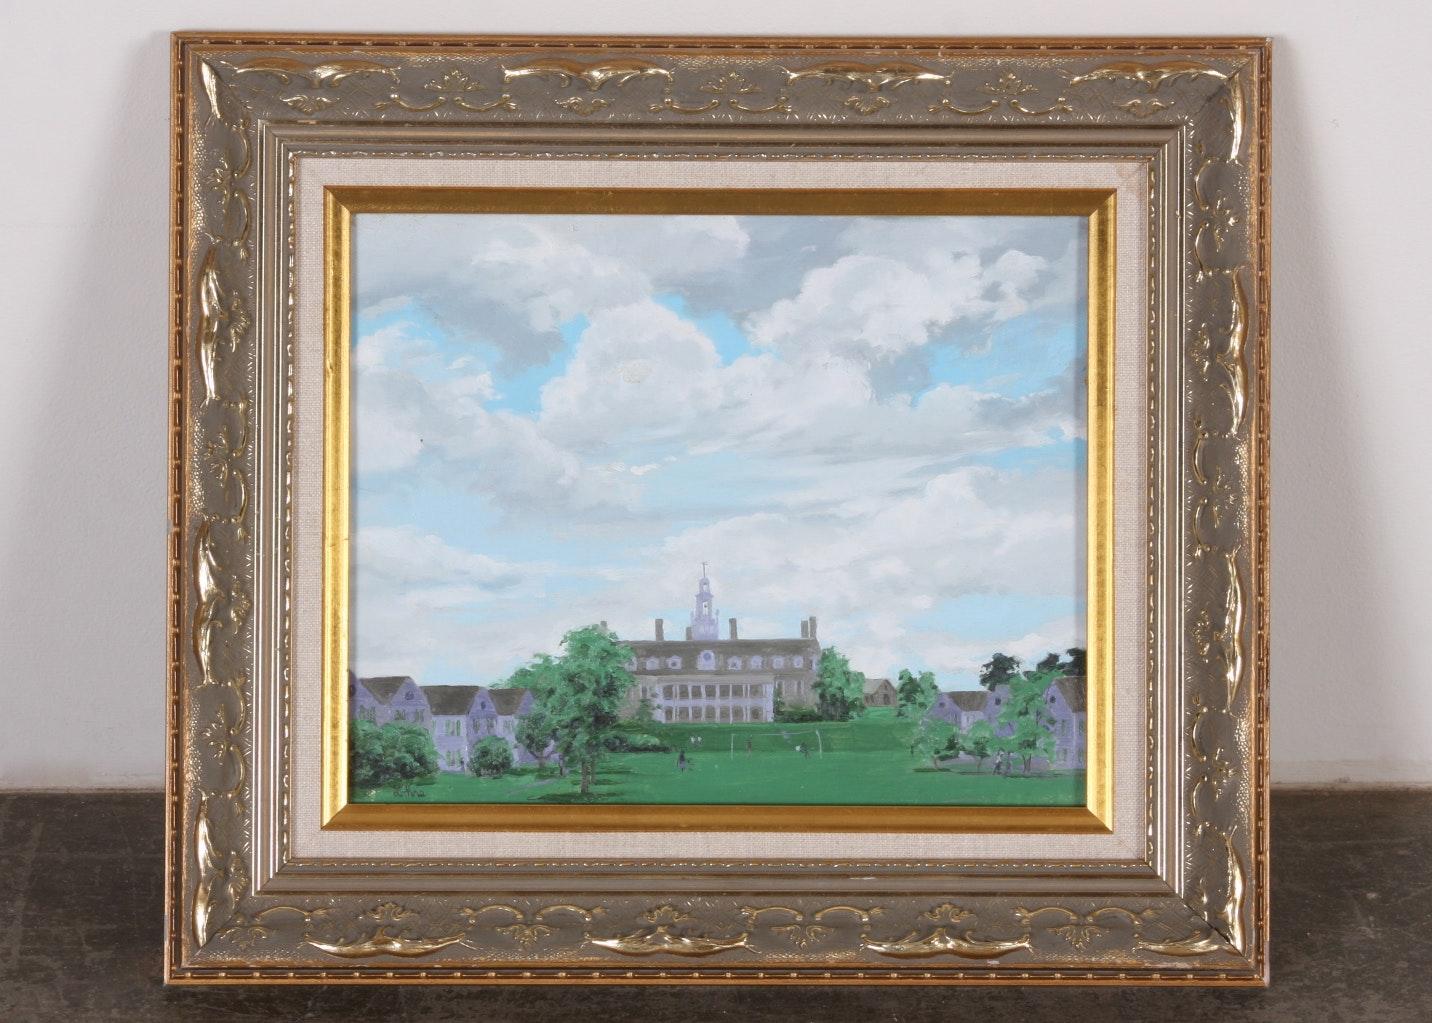 Original Tom Lohre Oil on Canvas Painting